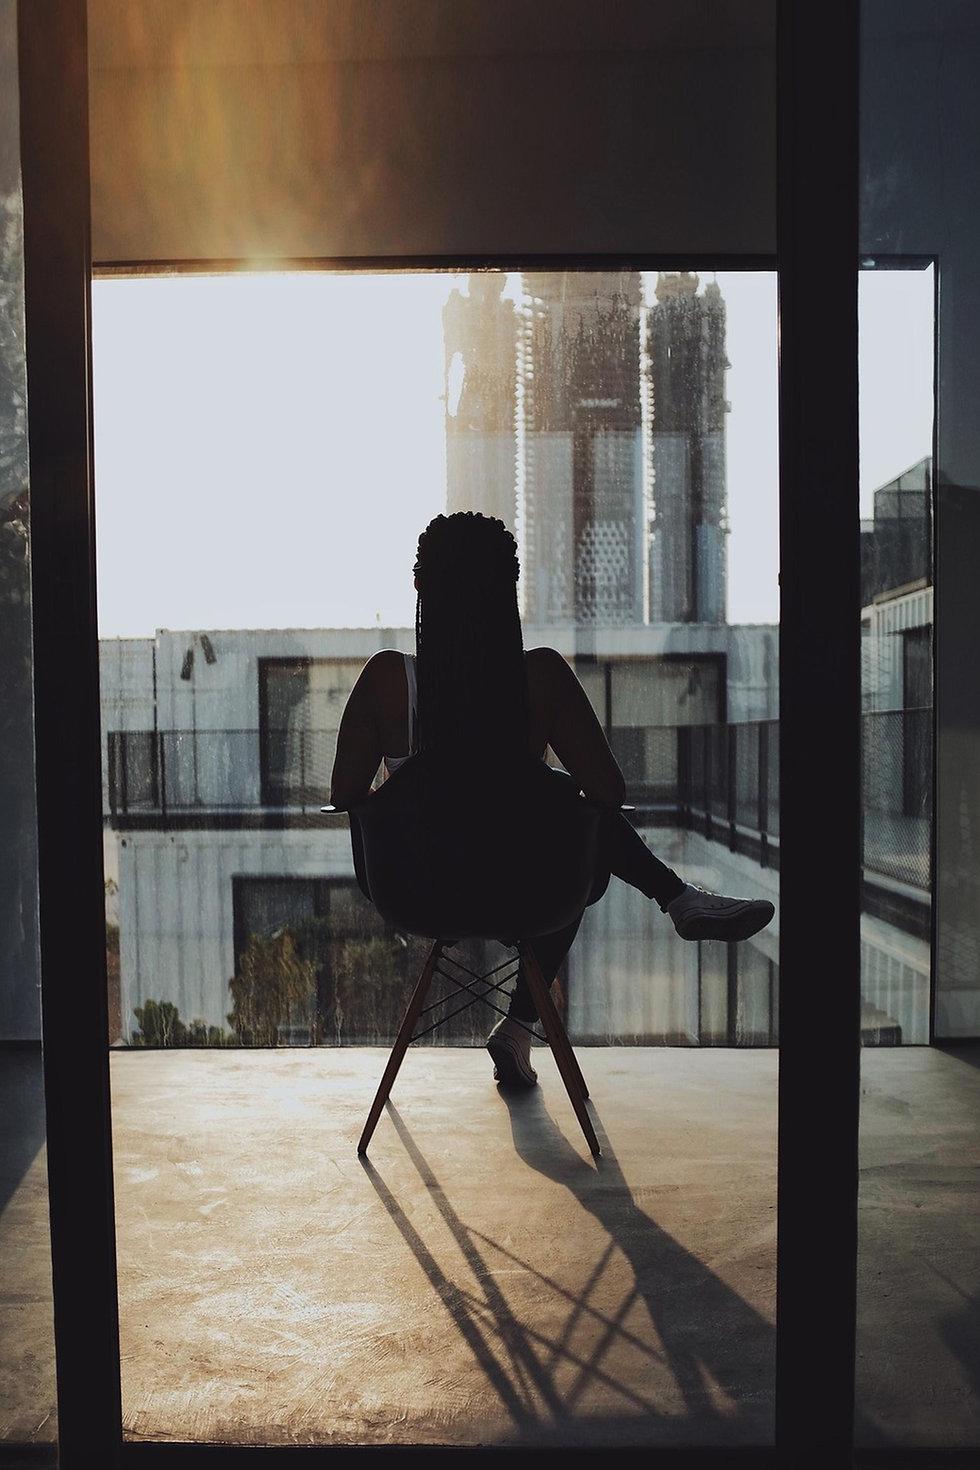 Sitting on Balcony